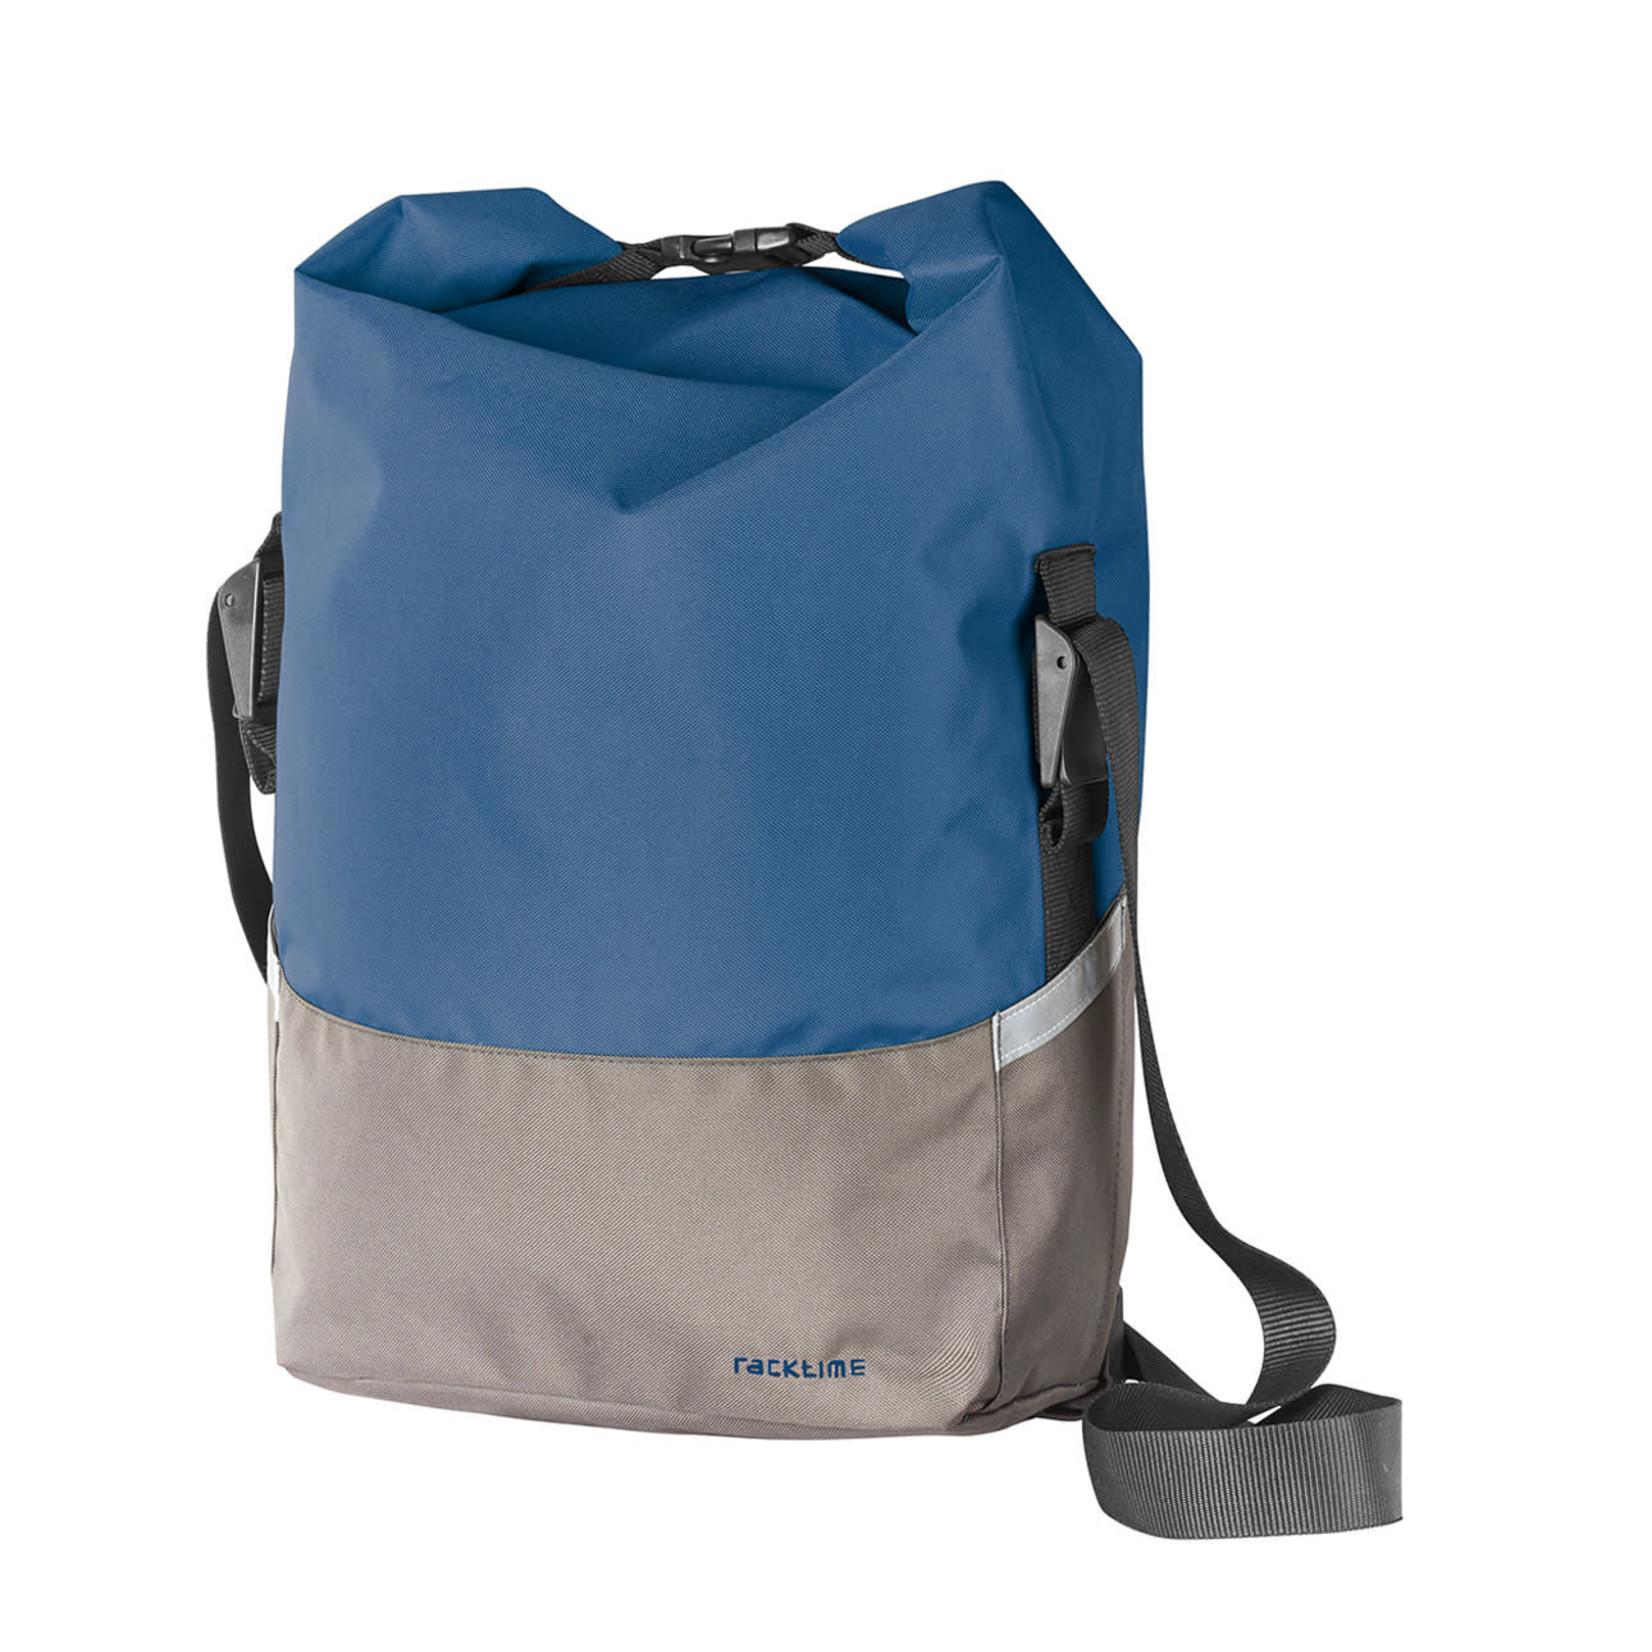 Racktime, Liva Sidebag, Berry Blue/Stone Grey